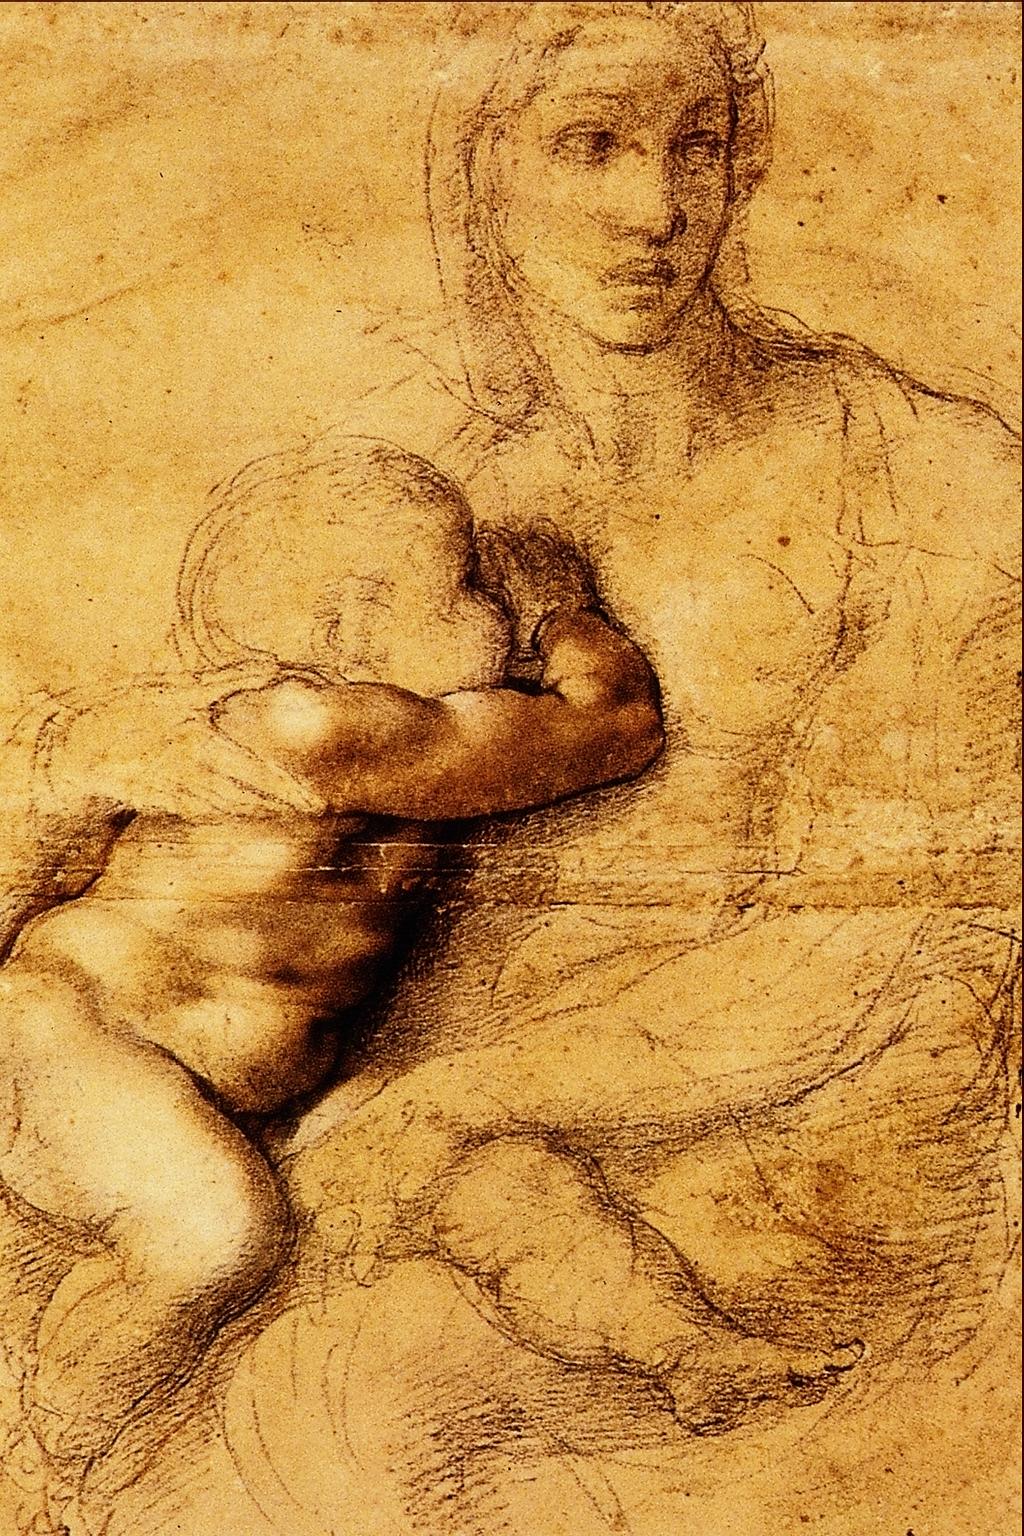 Michelangelo Buonarotti Biography